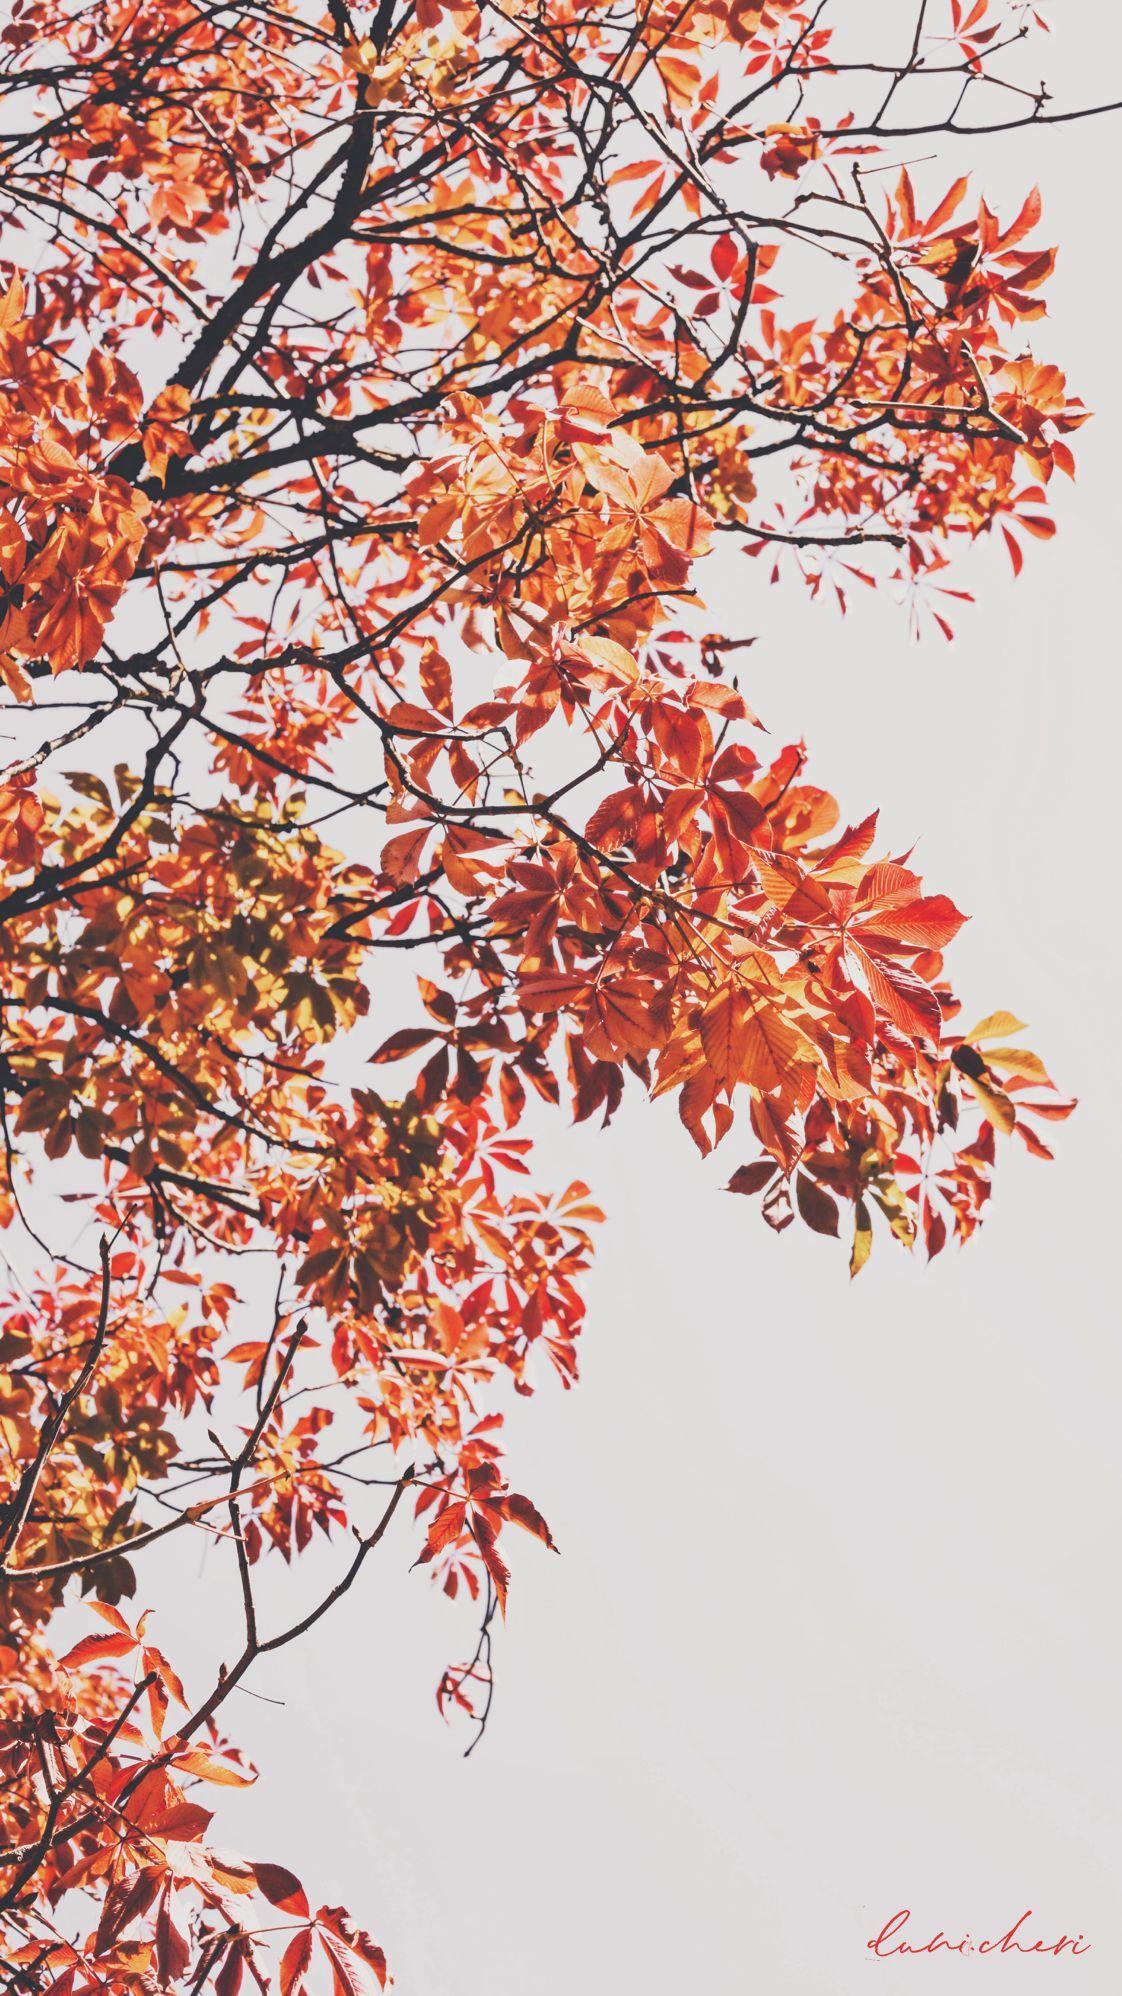 Free Download Autumn Wallpaper Desktop Und Mobile Gerate Autumn Phone Wallpaper Fall Wallpaper Aesthetic Wallpapers